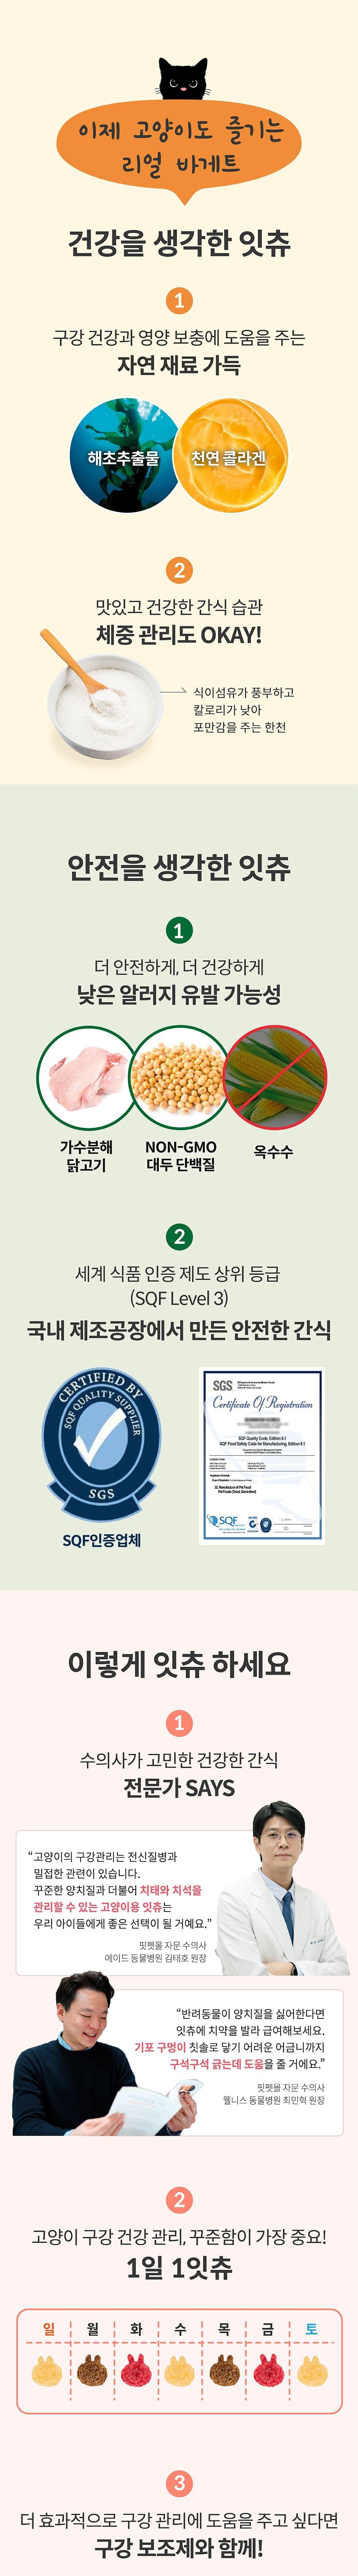 it 더 잇츄 캣 (치킨&사과/황태&고구마/연어&레드비트)-상품이미지-15